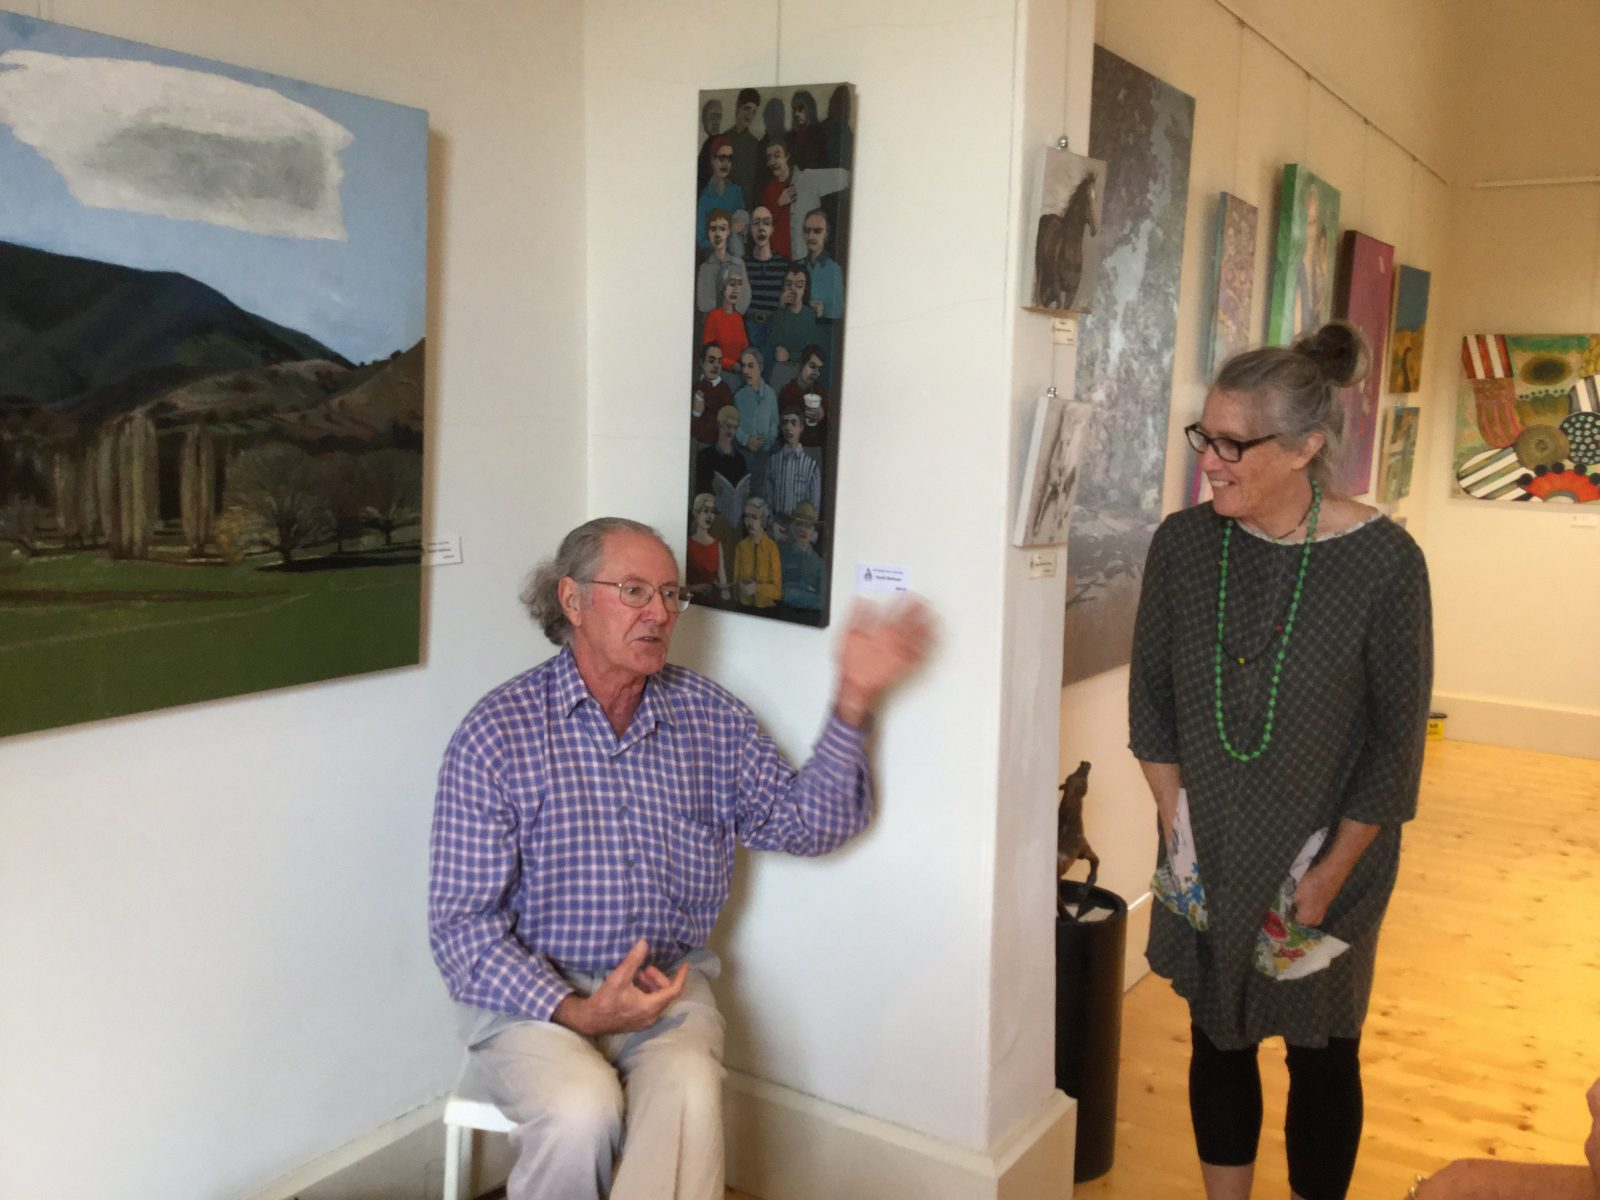 Award winning artist David Mellows discusses his work (background)